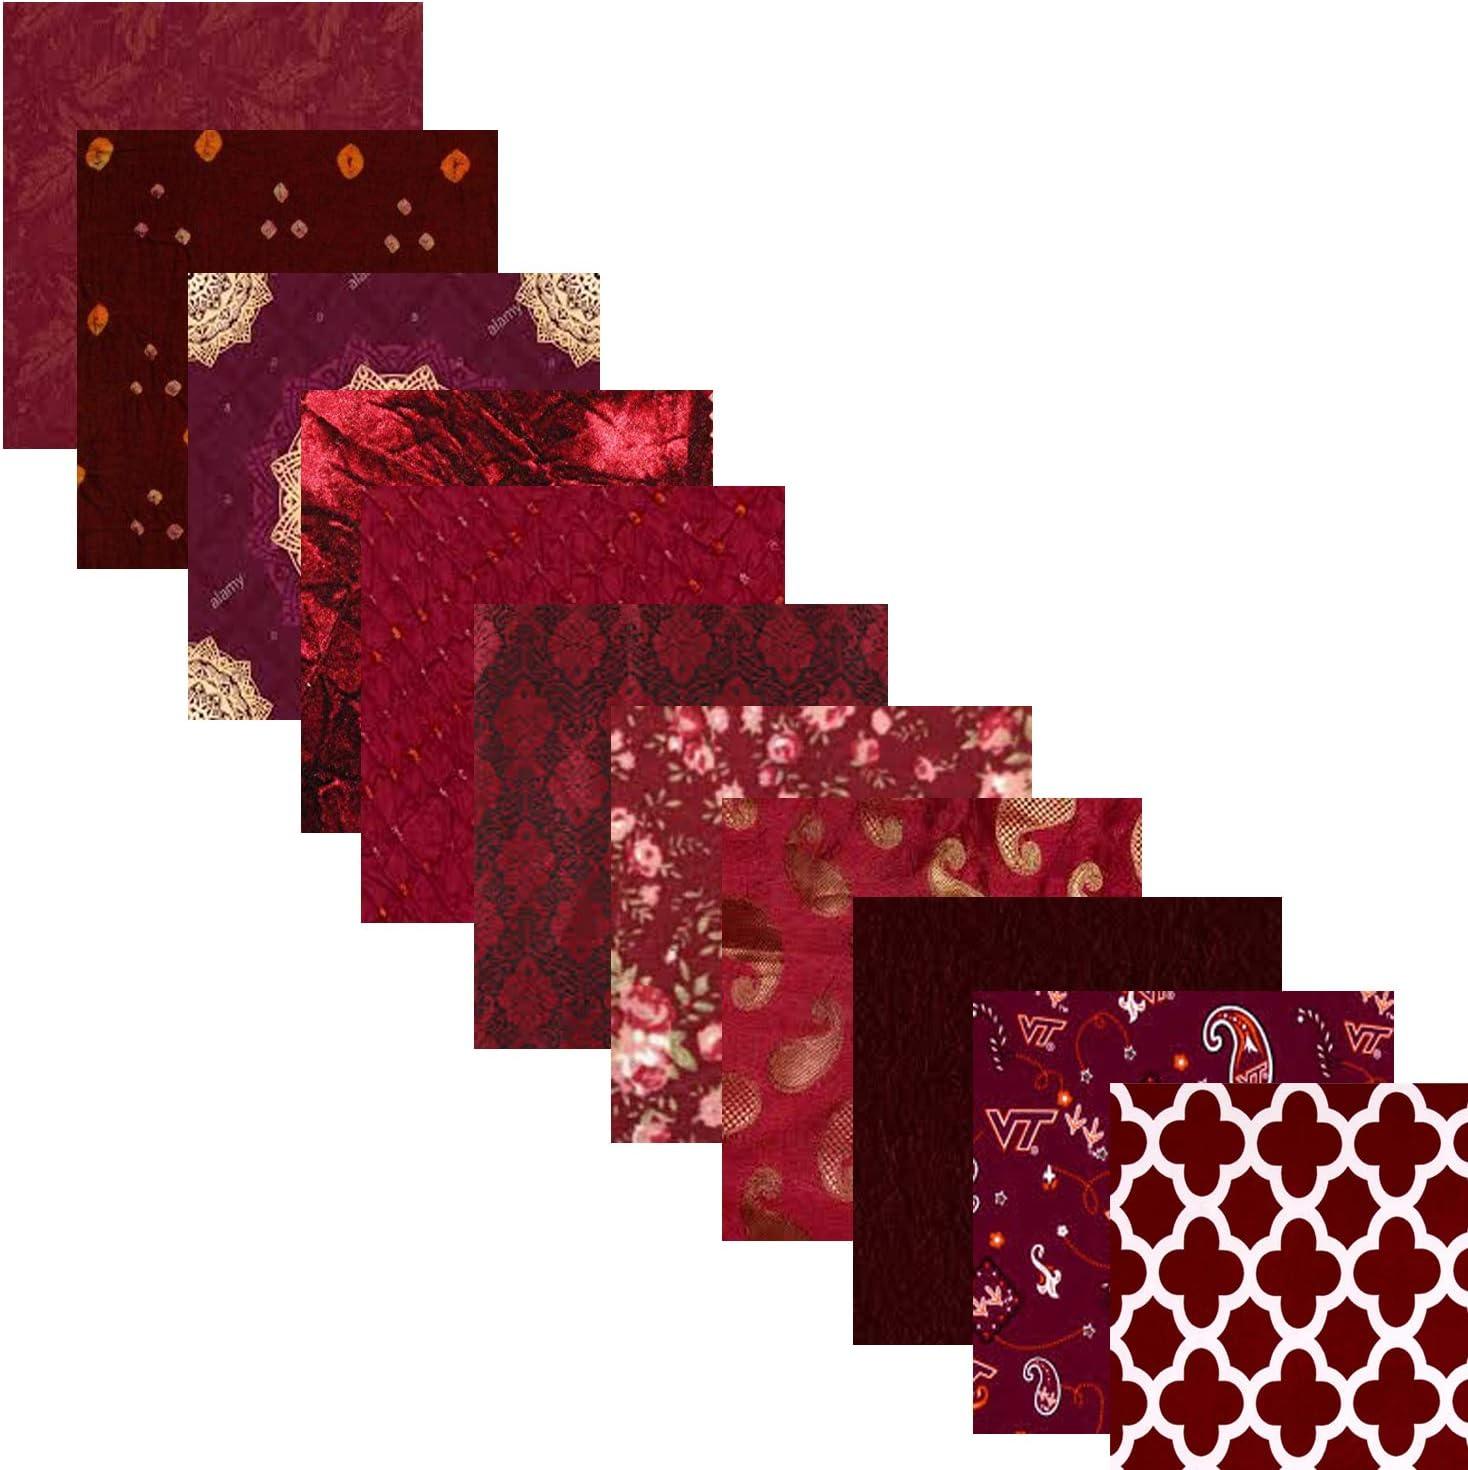 Burgundy Satin Lining Fabric Dark Red Fat Quarter - 18 x 30 Maroon Sample Size Fabric